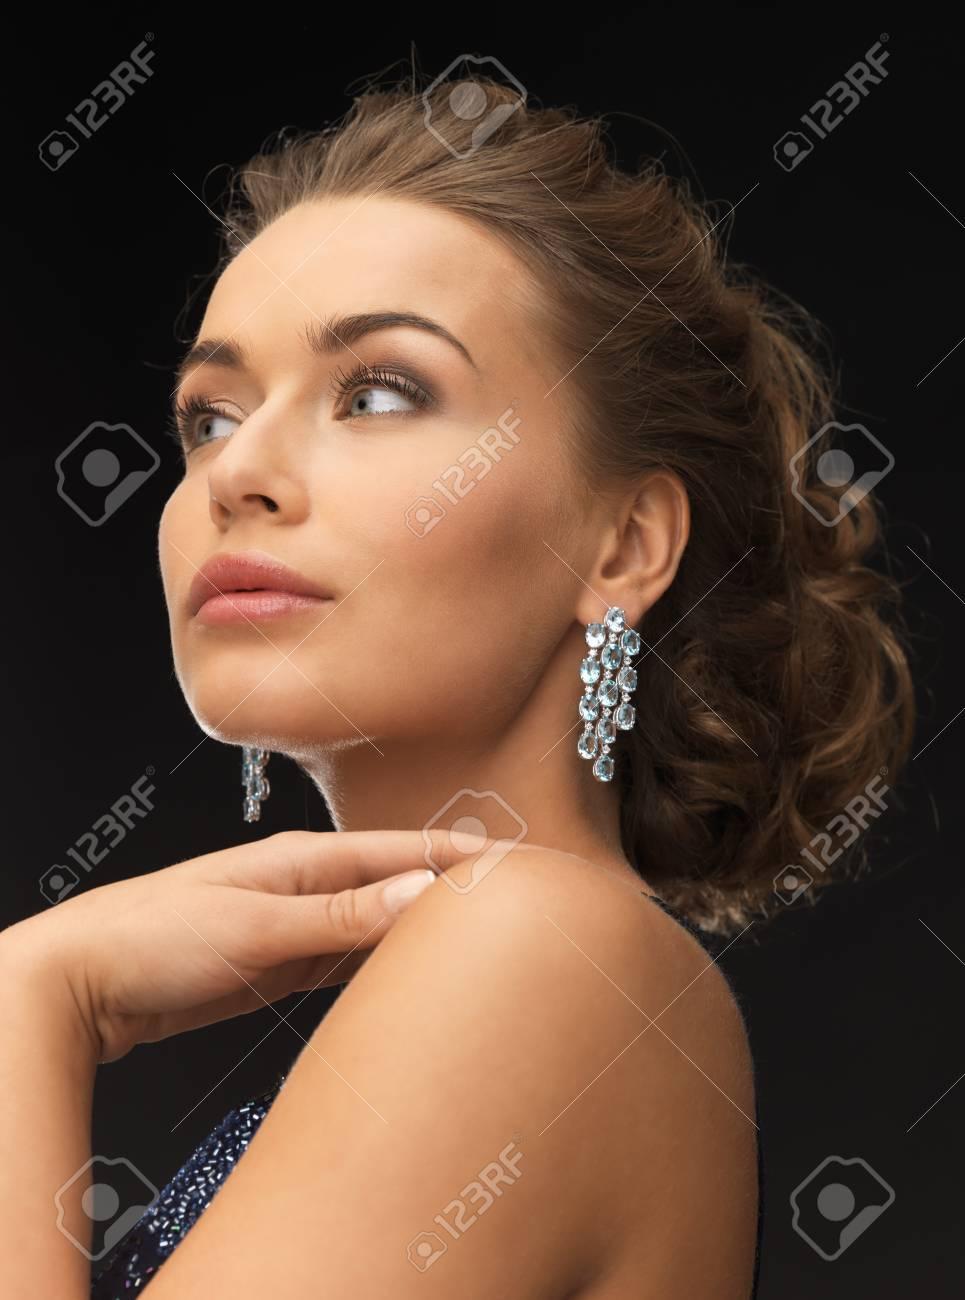 beautiful woman in evening dress wearing diamond earrings Stock Photo - 19347187